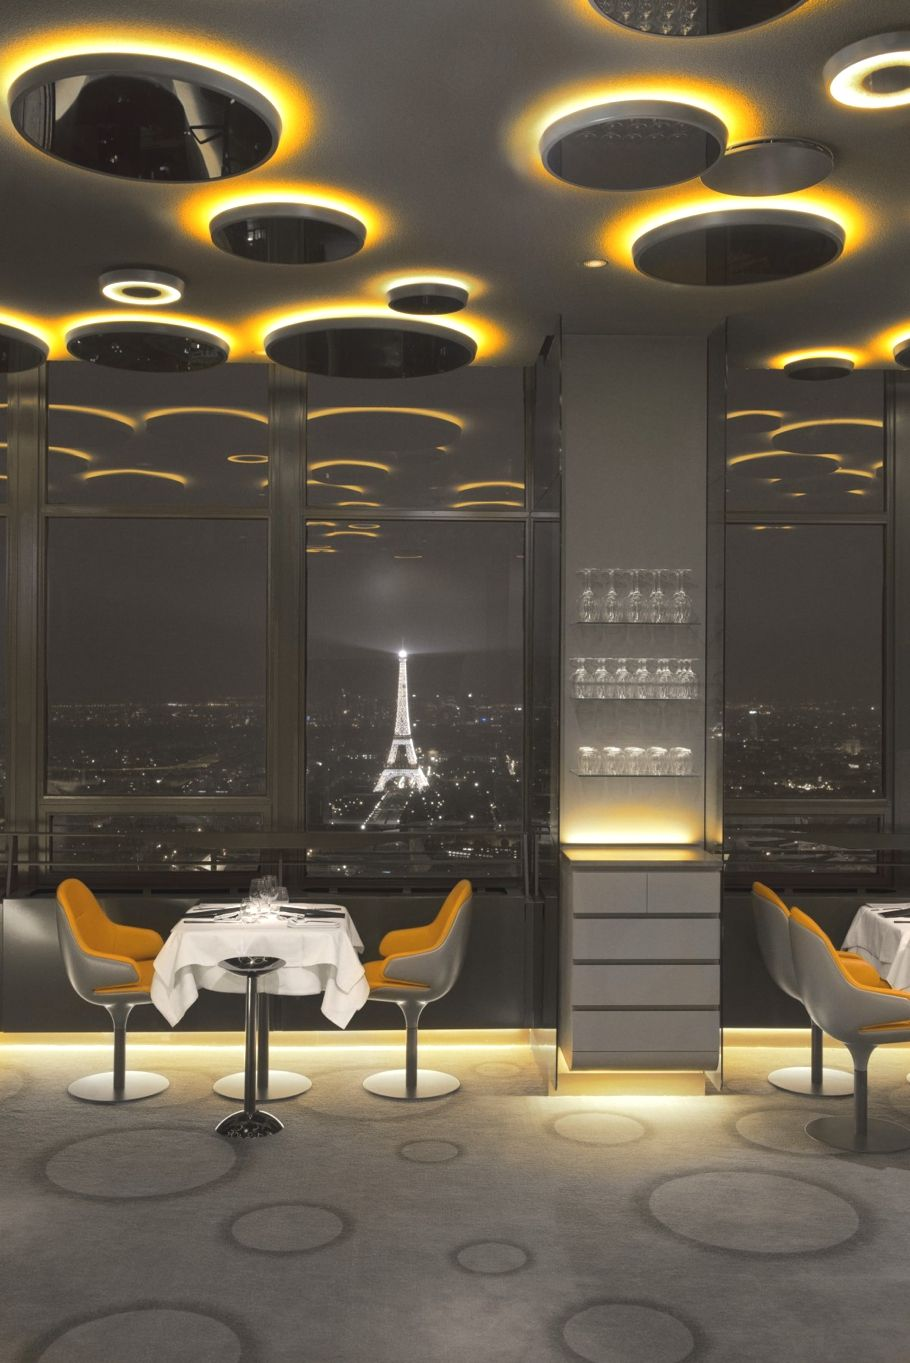 Ciel De Paris Restaurant Http Www Adelto Co Uk Uber Luxue Ciel De Paris Restaurant Interior Design Examples Restaurant Interior Restaurant Interior Design